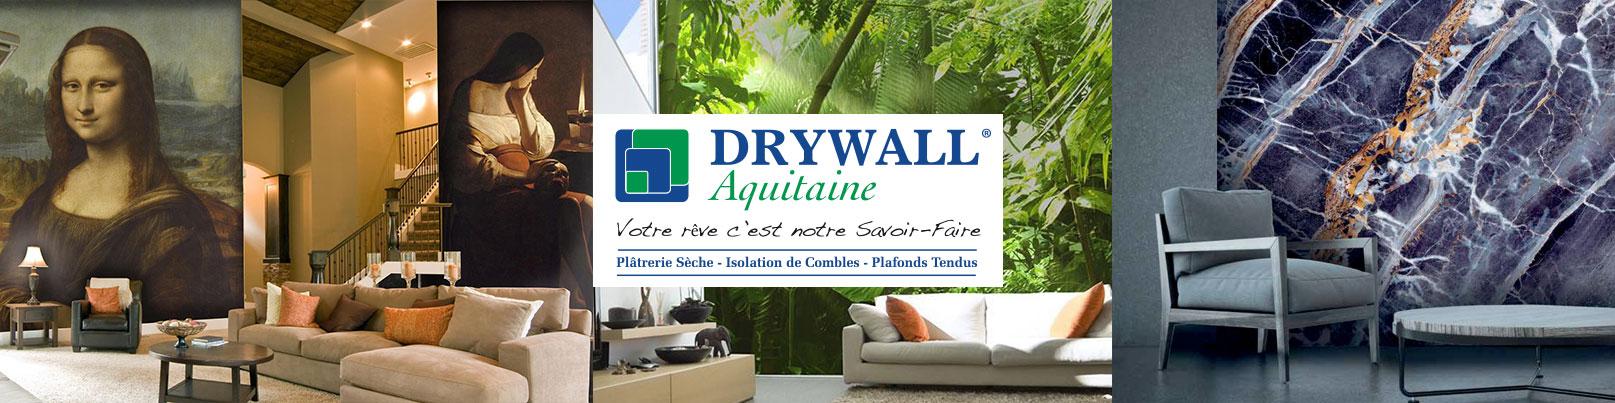 artolis-barrisol-drywall-aquitaine-2020